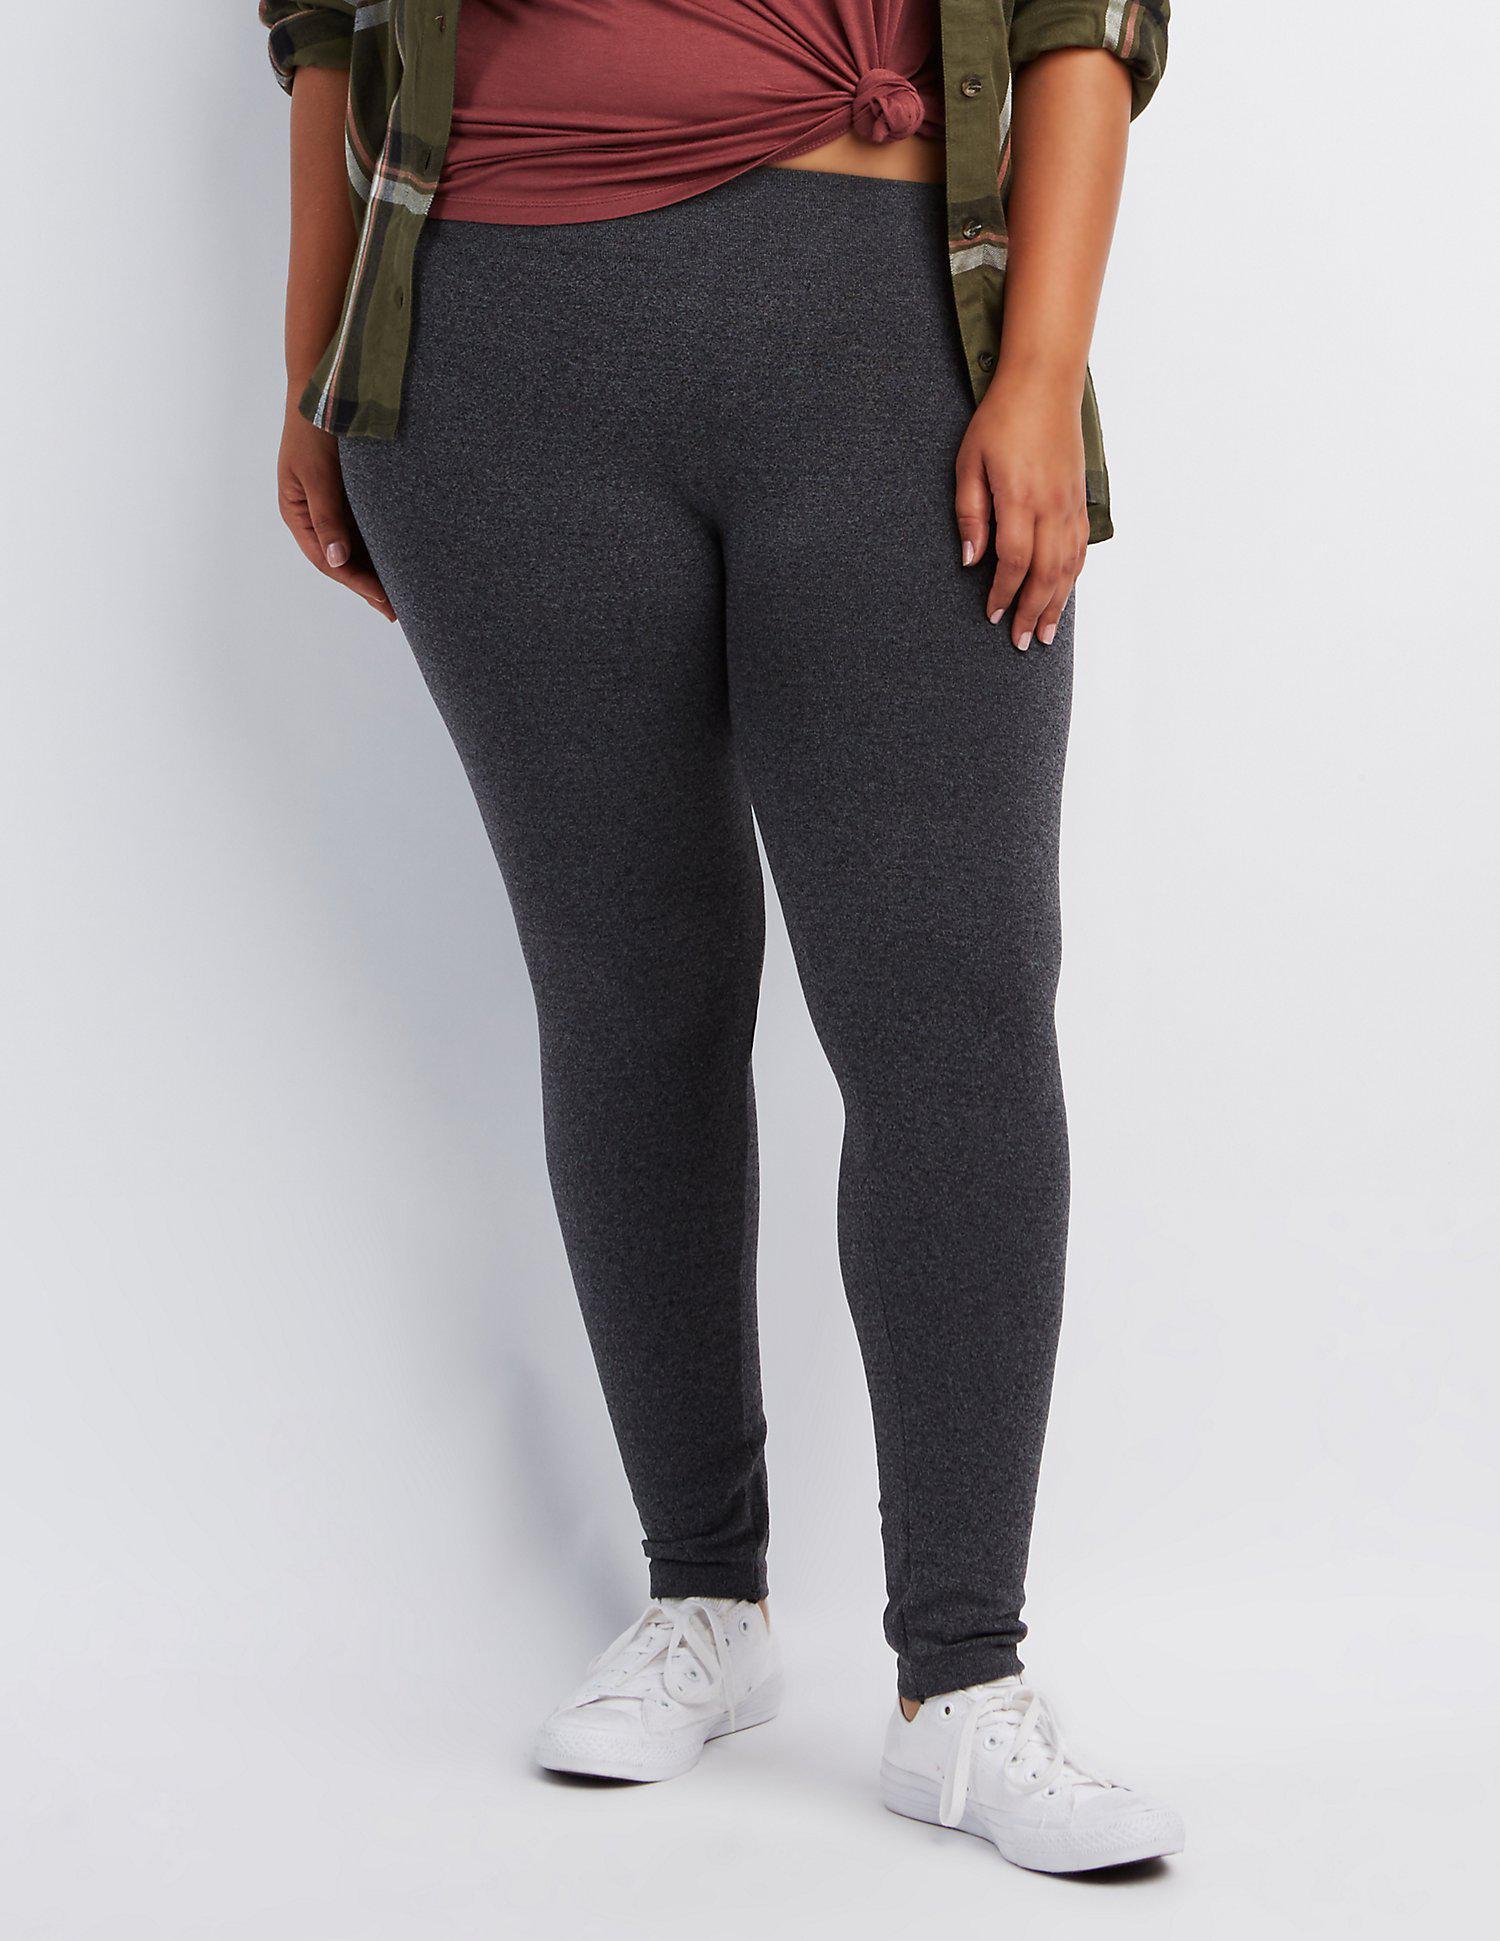 3488c8ac71bad5 Lyst - Charlotte Russe Plus Size Fleece Lined Leggings in Gray